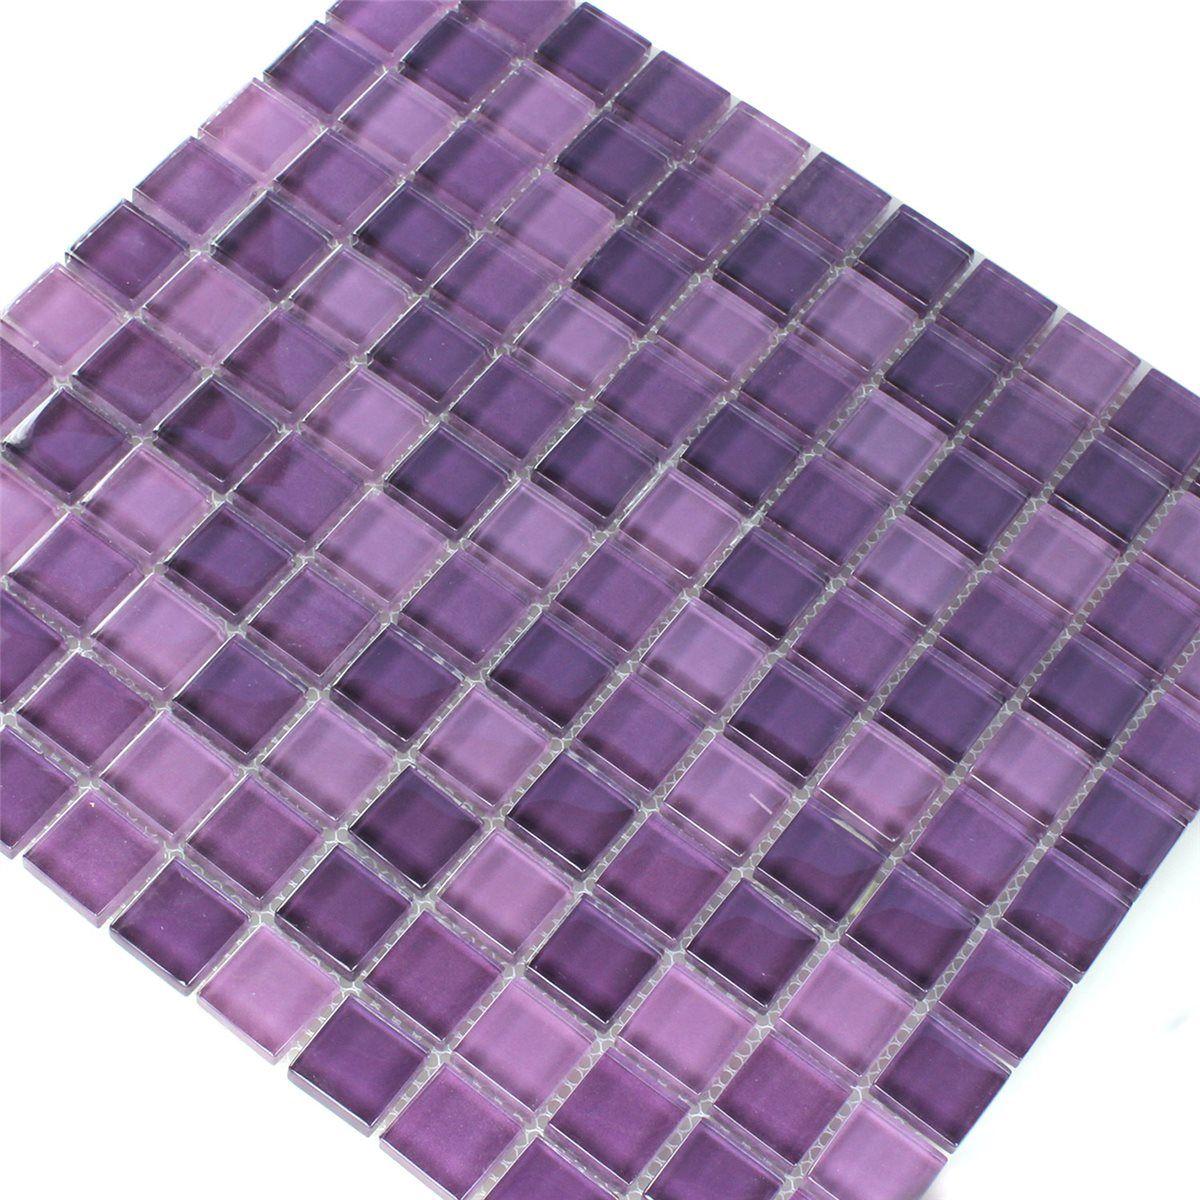 Kitchen Tiles Purple purple glass tile backsplash - google search   kitchen tile and